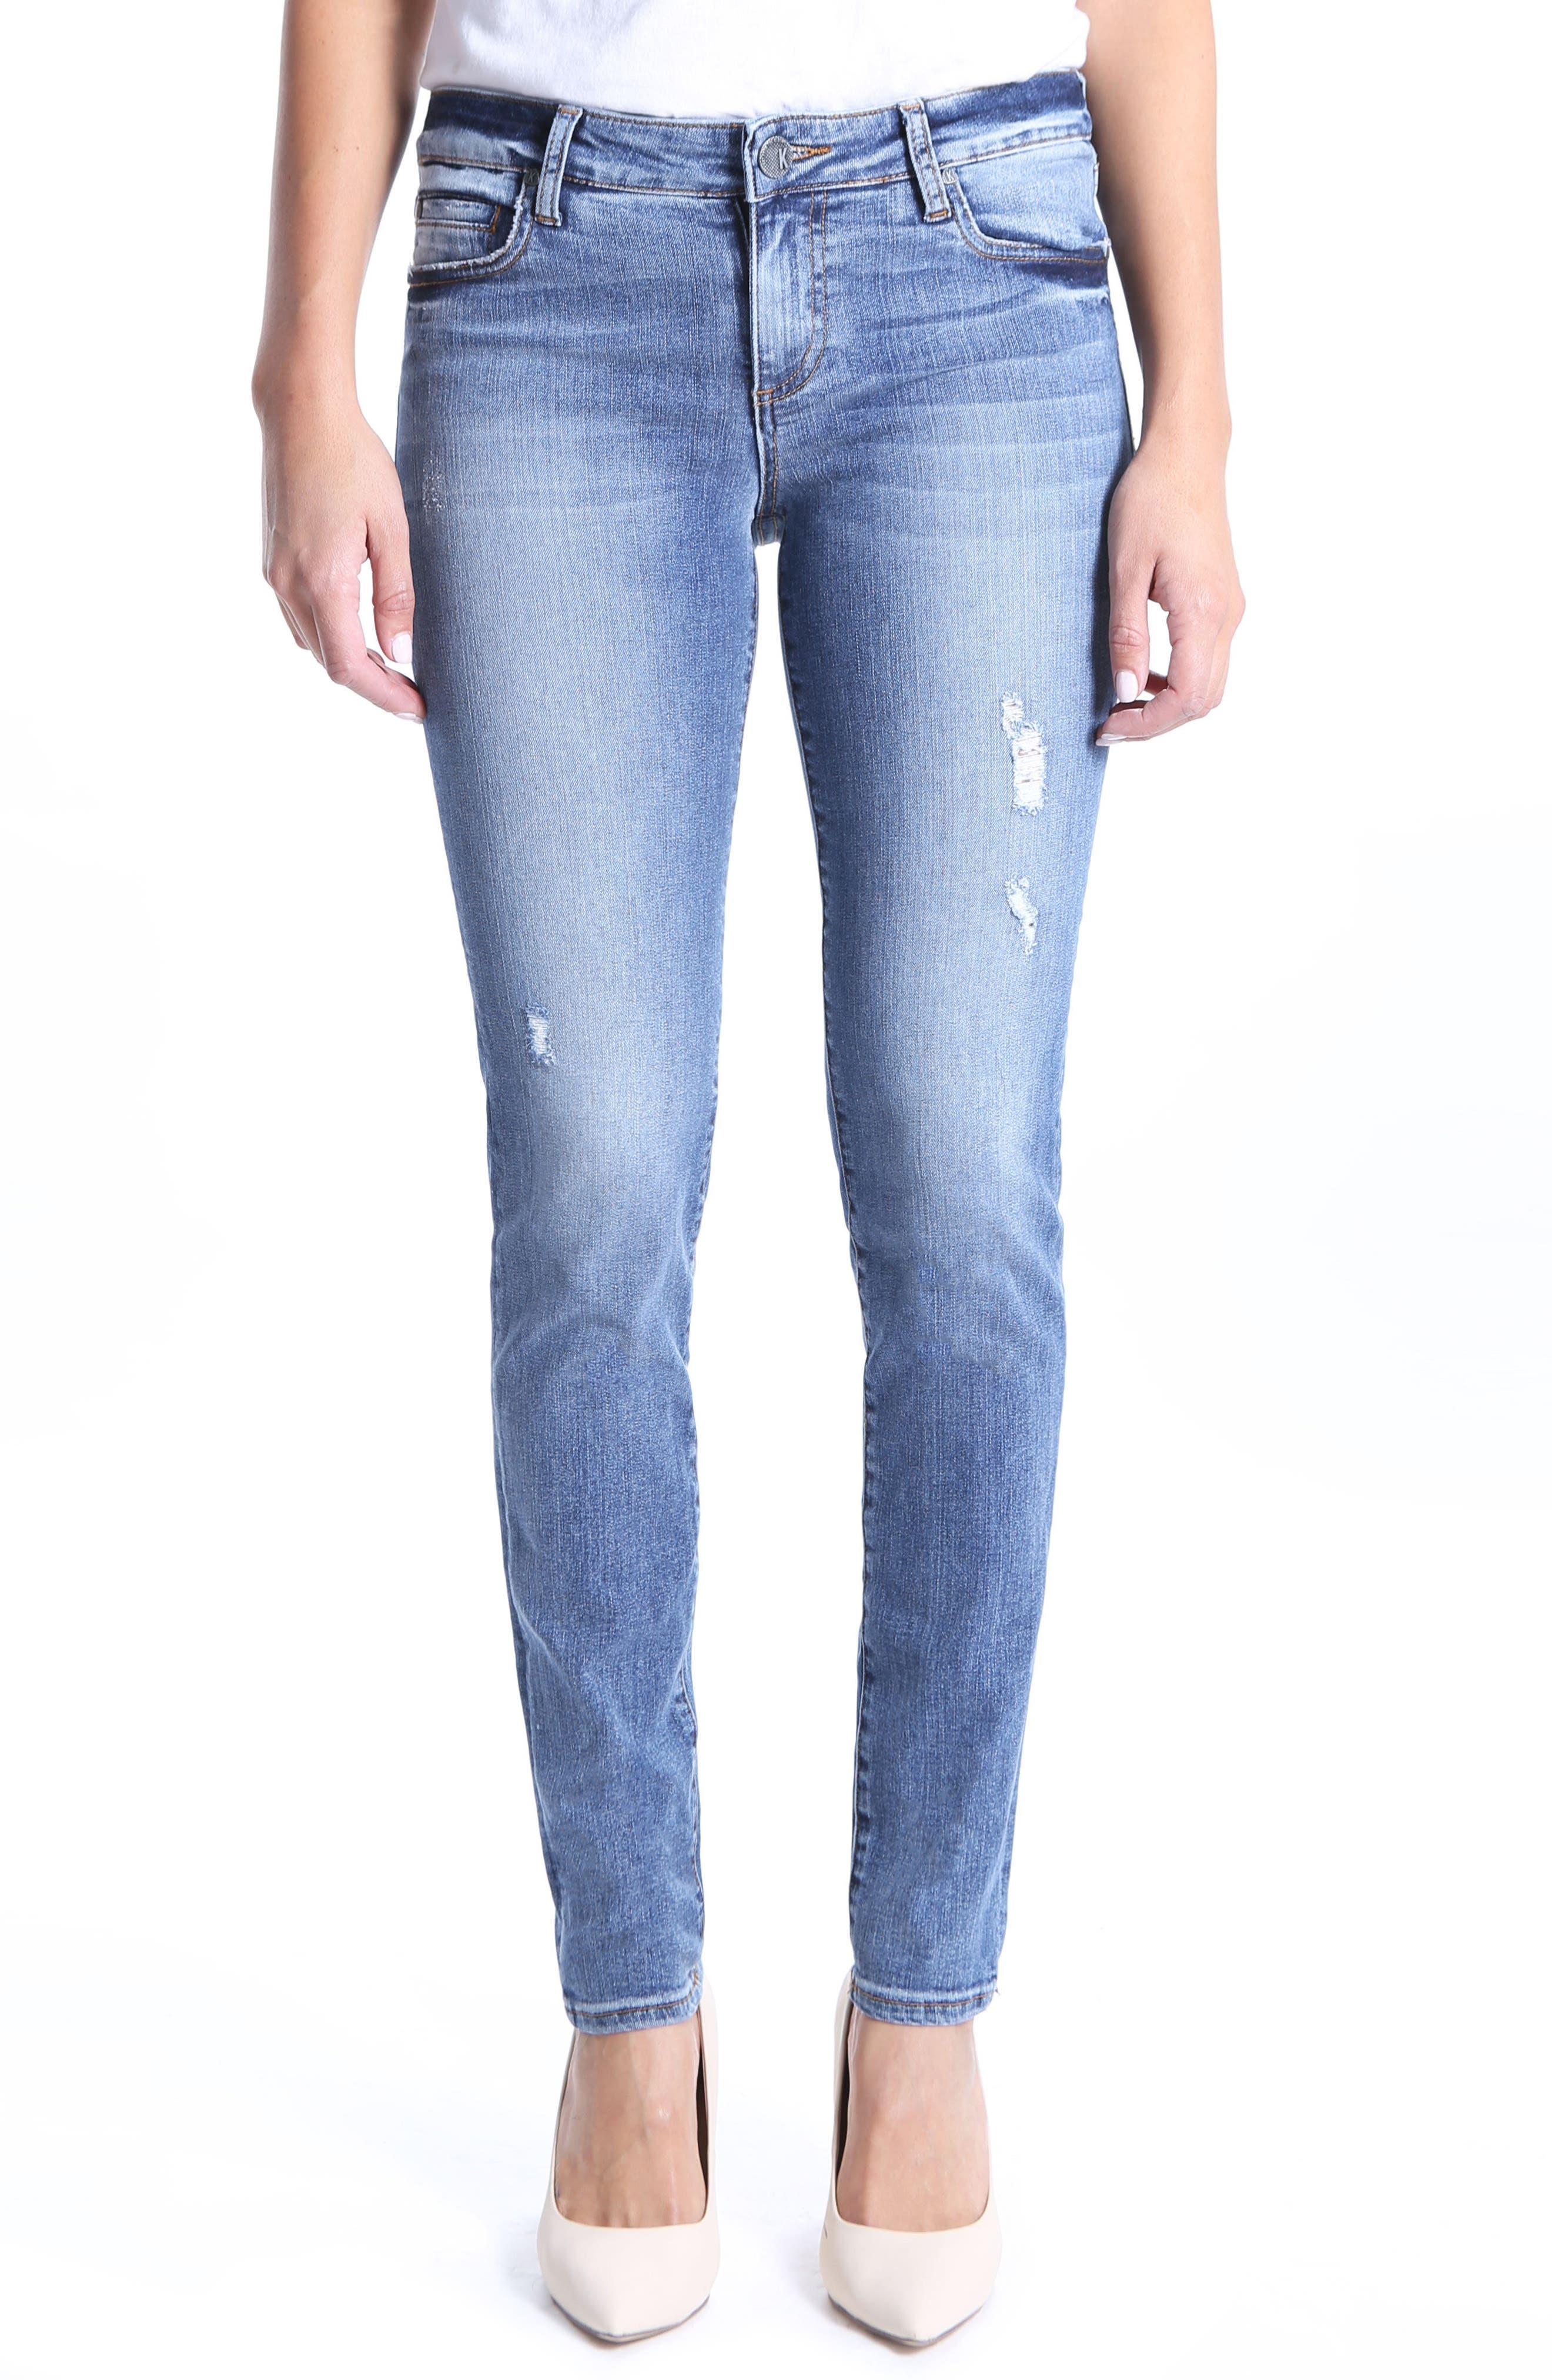 Diana Stretch Skinny Jeans,                         Main,                         color, Clarified